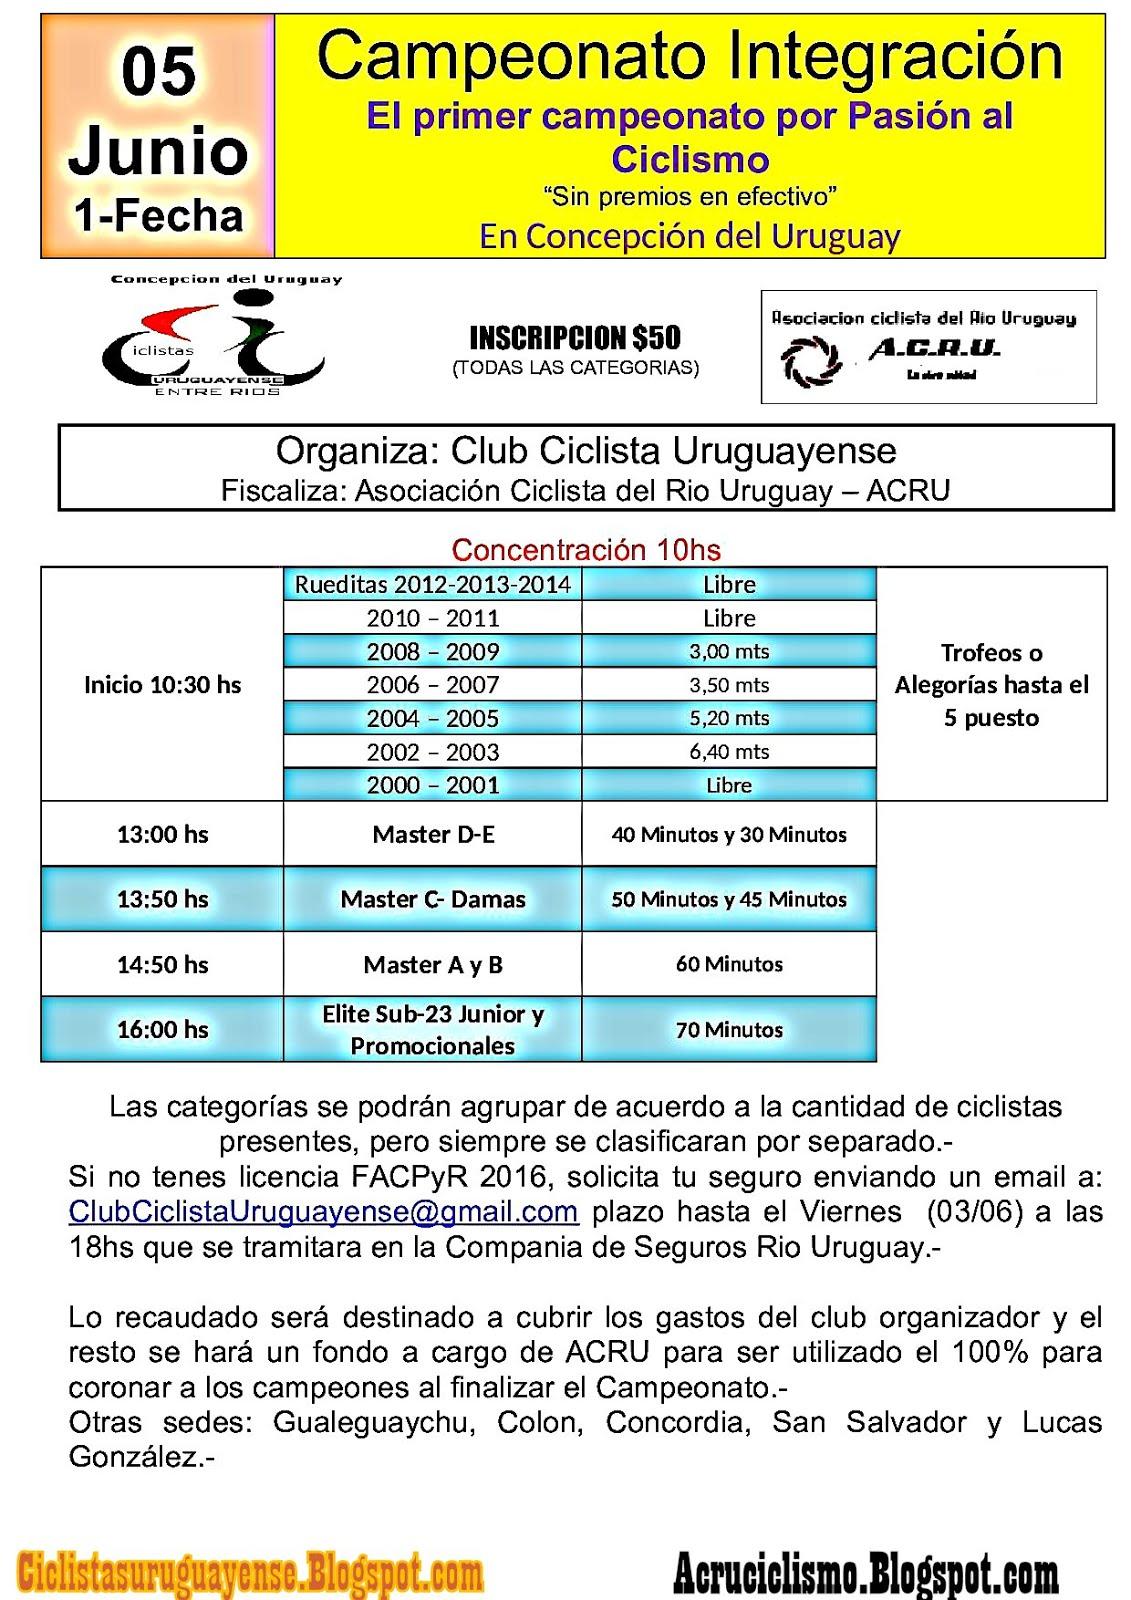 Campeonato Integracion